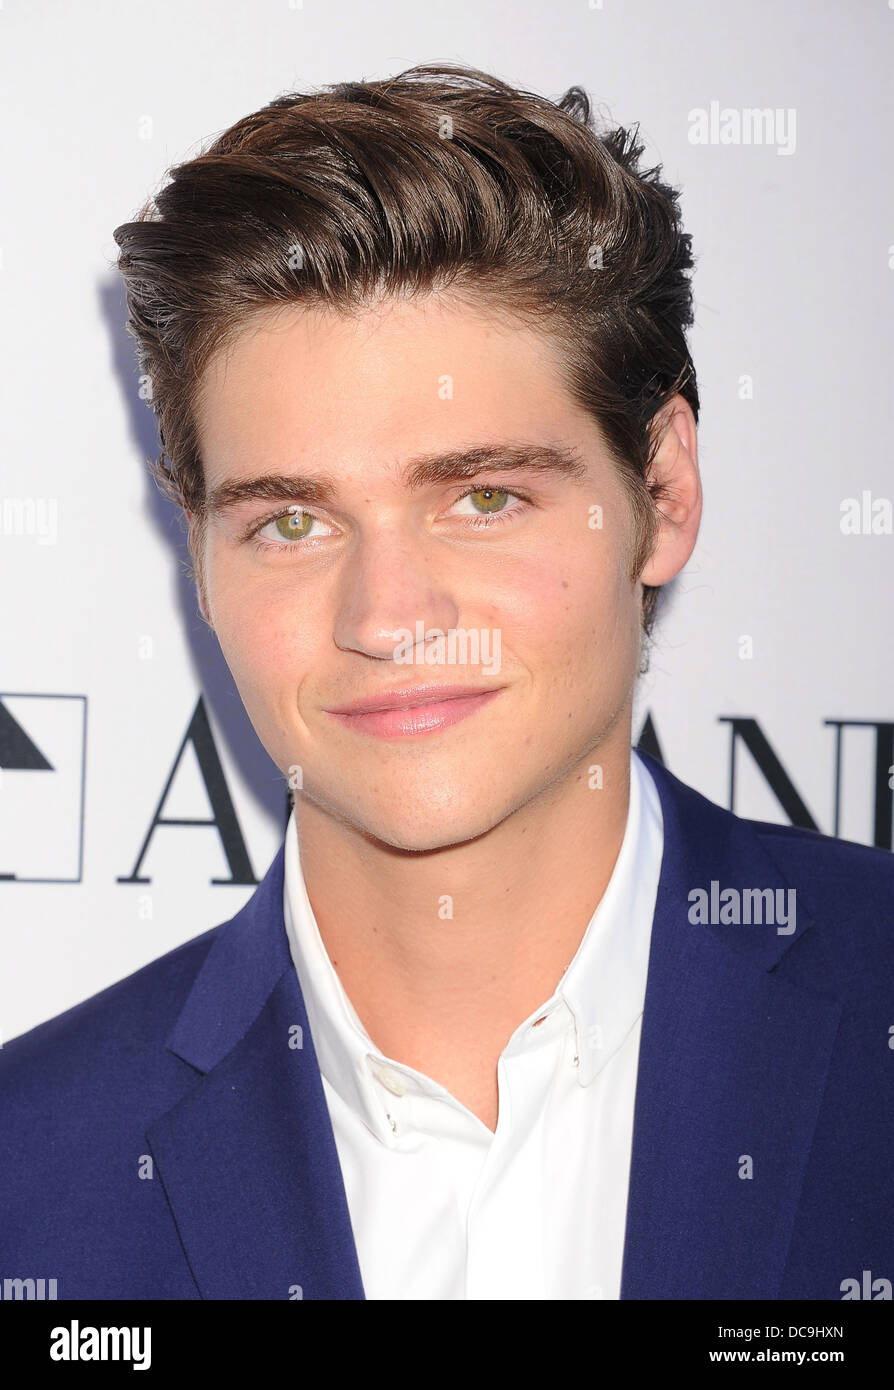 WILL PELT US film actor in August 2013. Photo Jeffrey Mayer - Stock Image